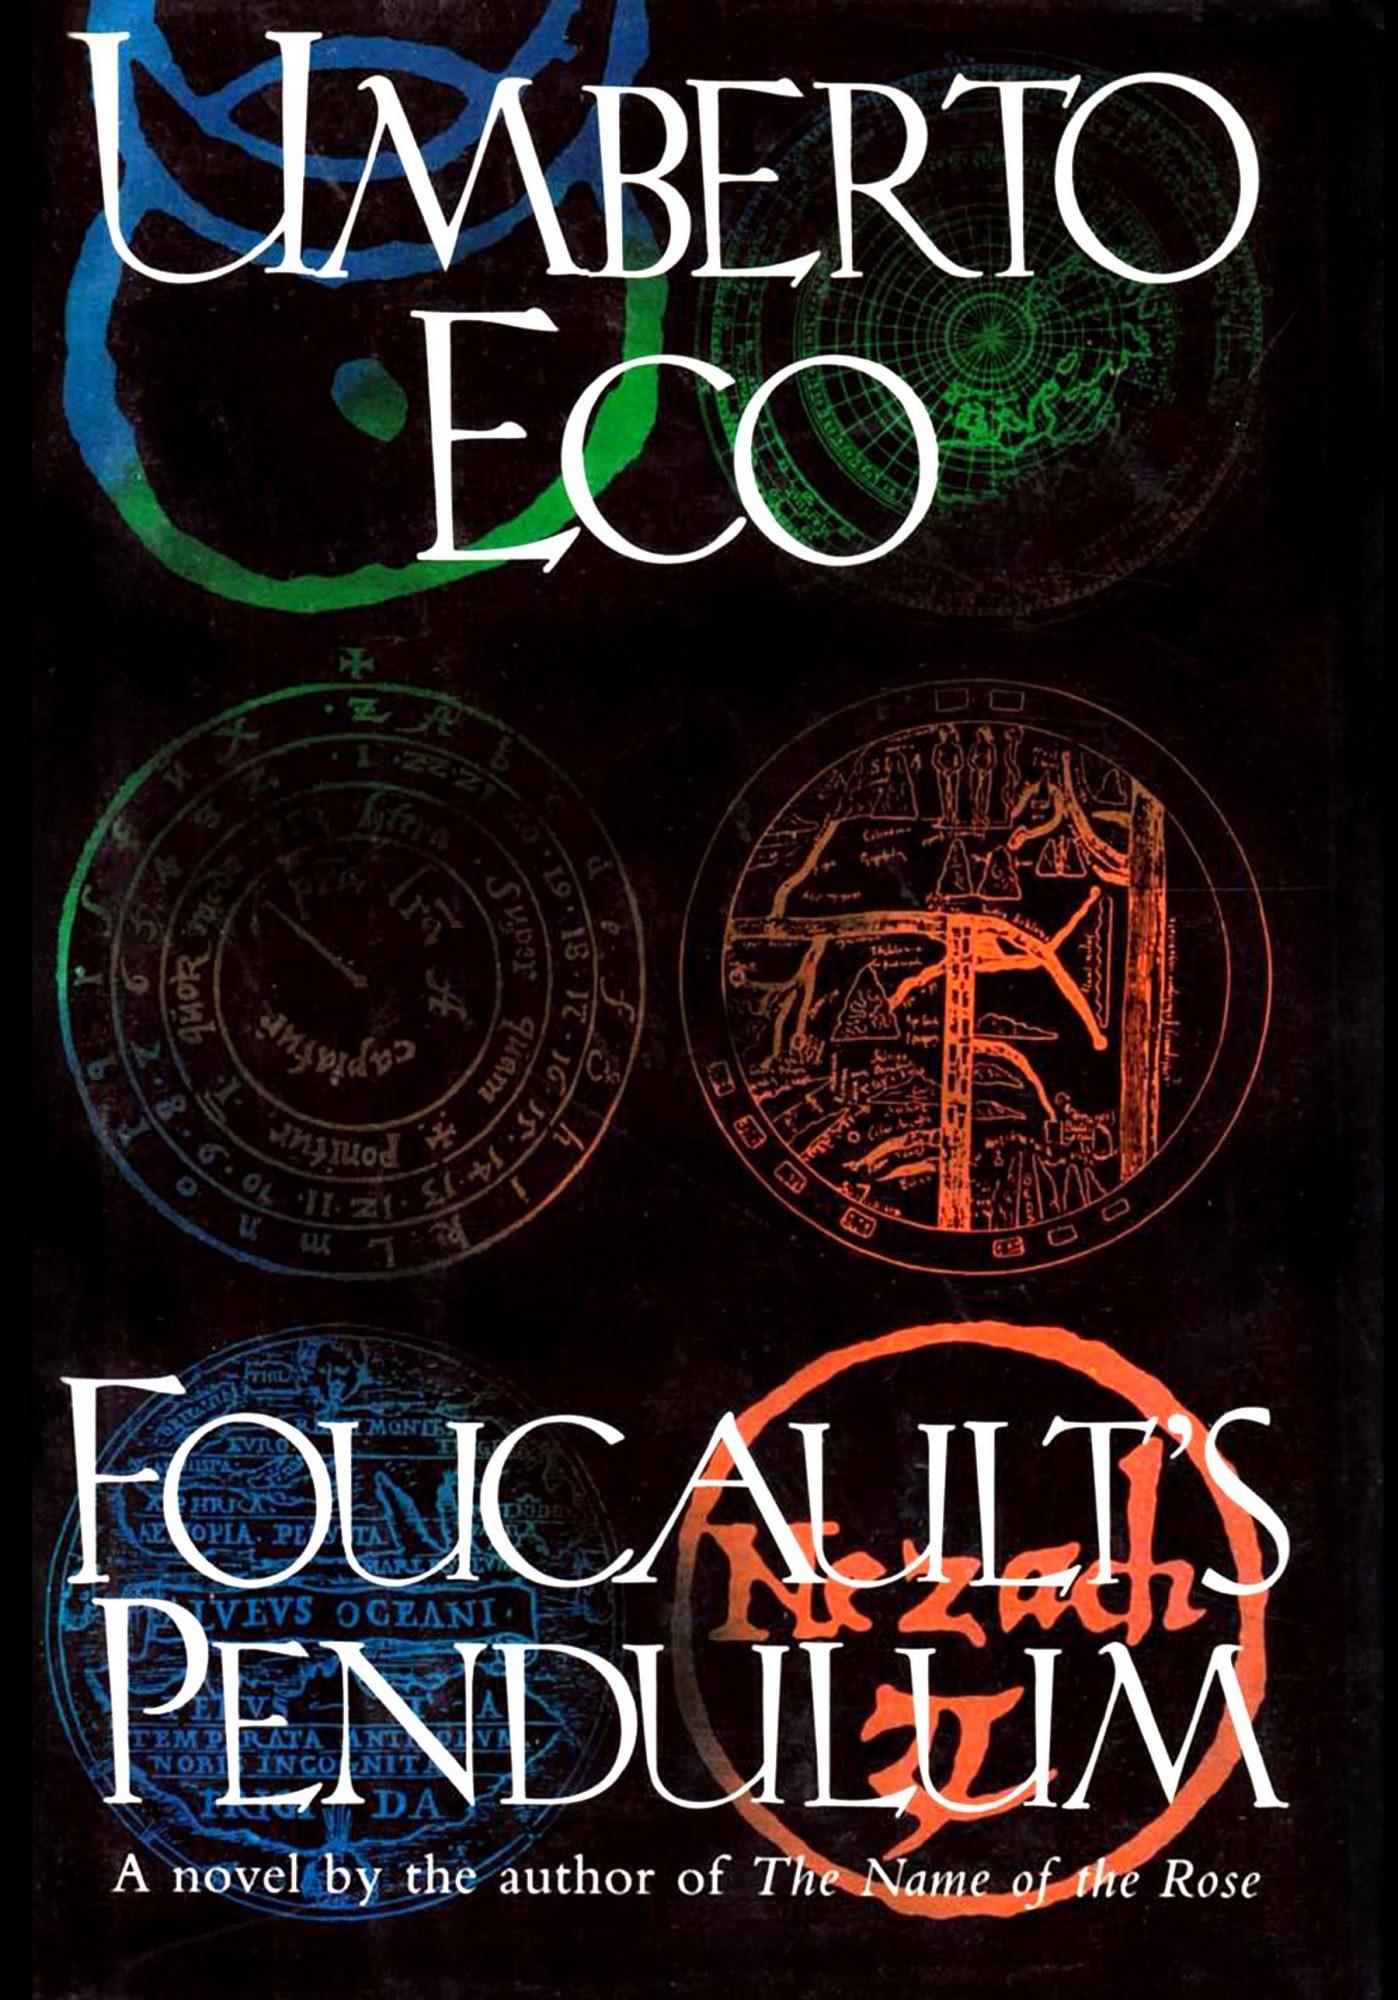 Foucault's Pendulum by Umberto Eco CR: Harcourt Brace Jovanovich